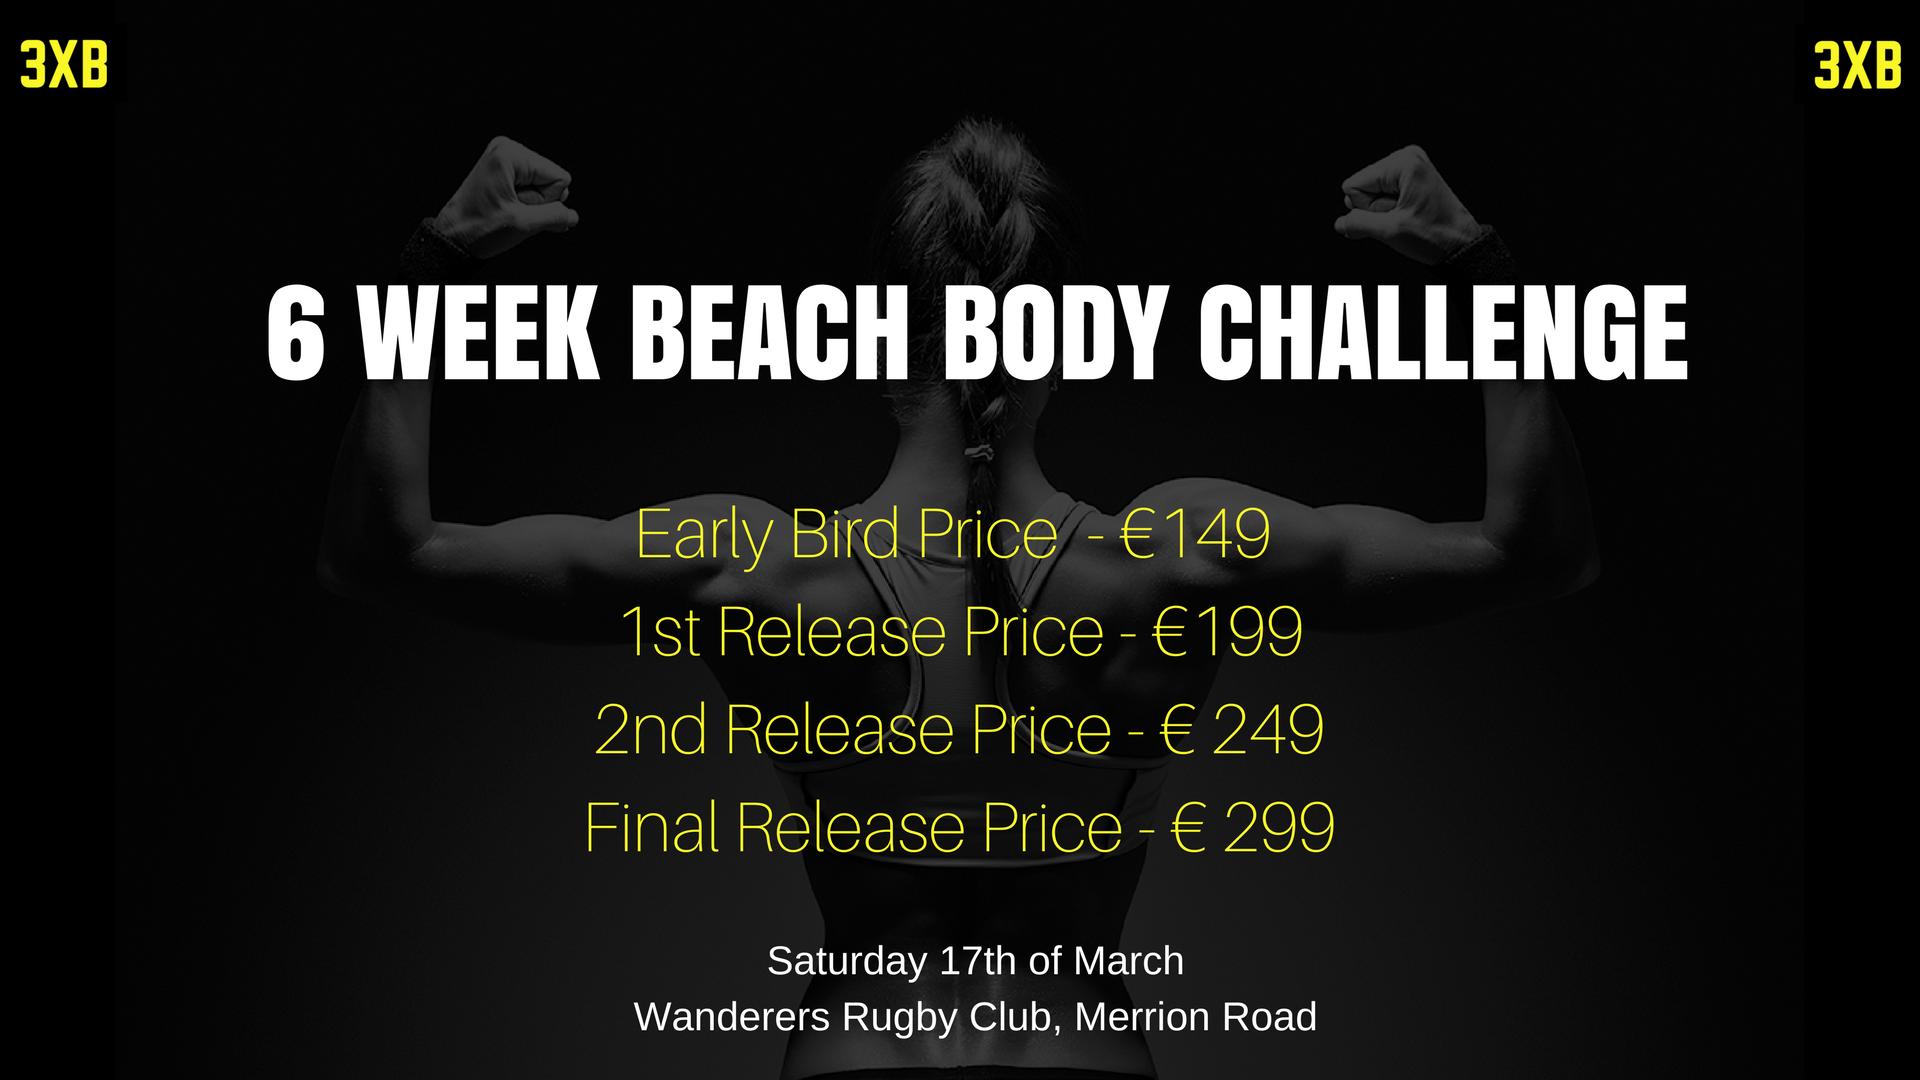 6 WEEK BEACH BODY CHALLENGE (2).png